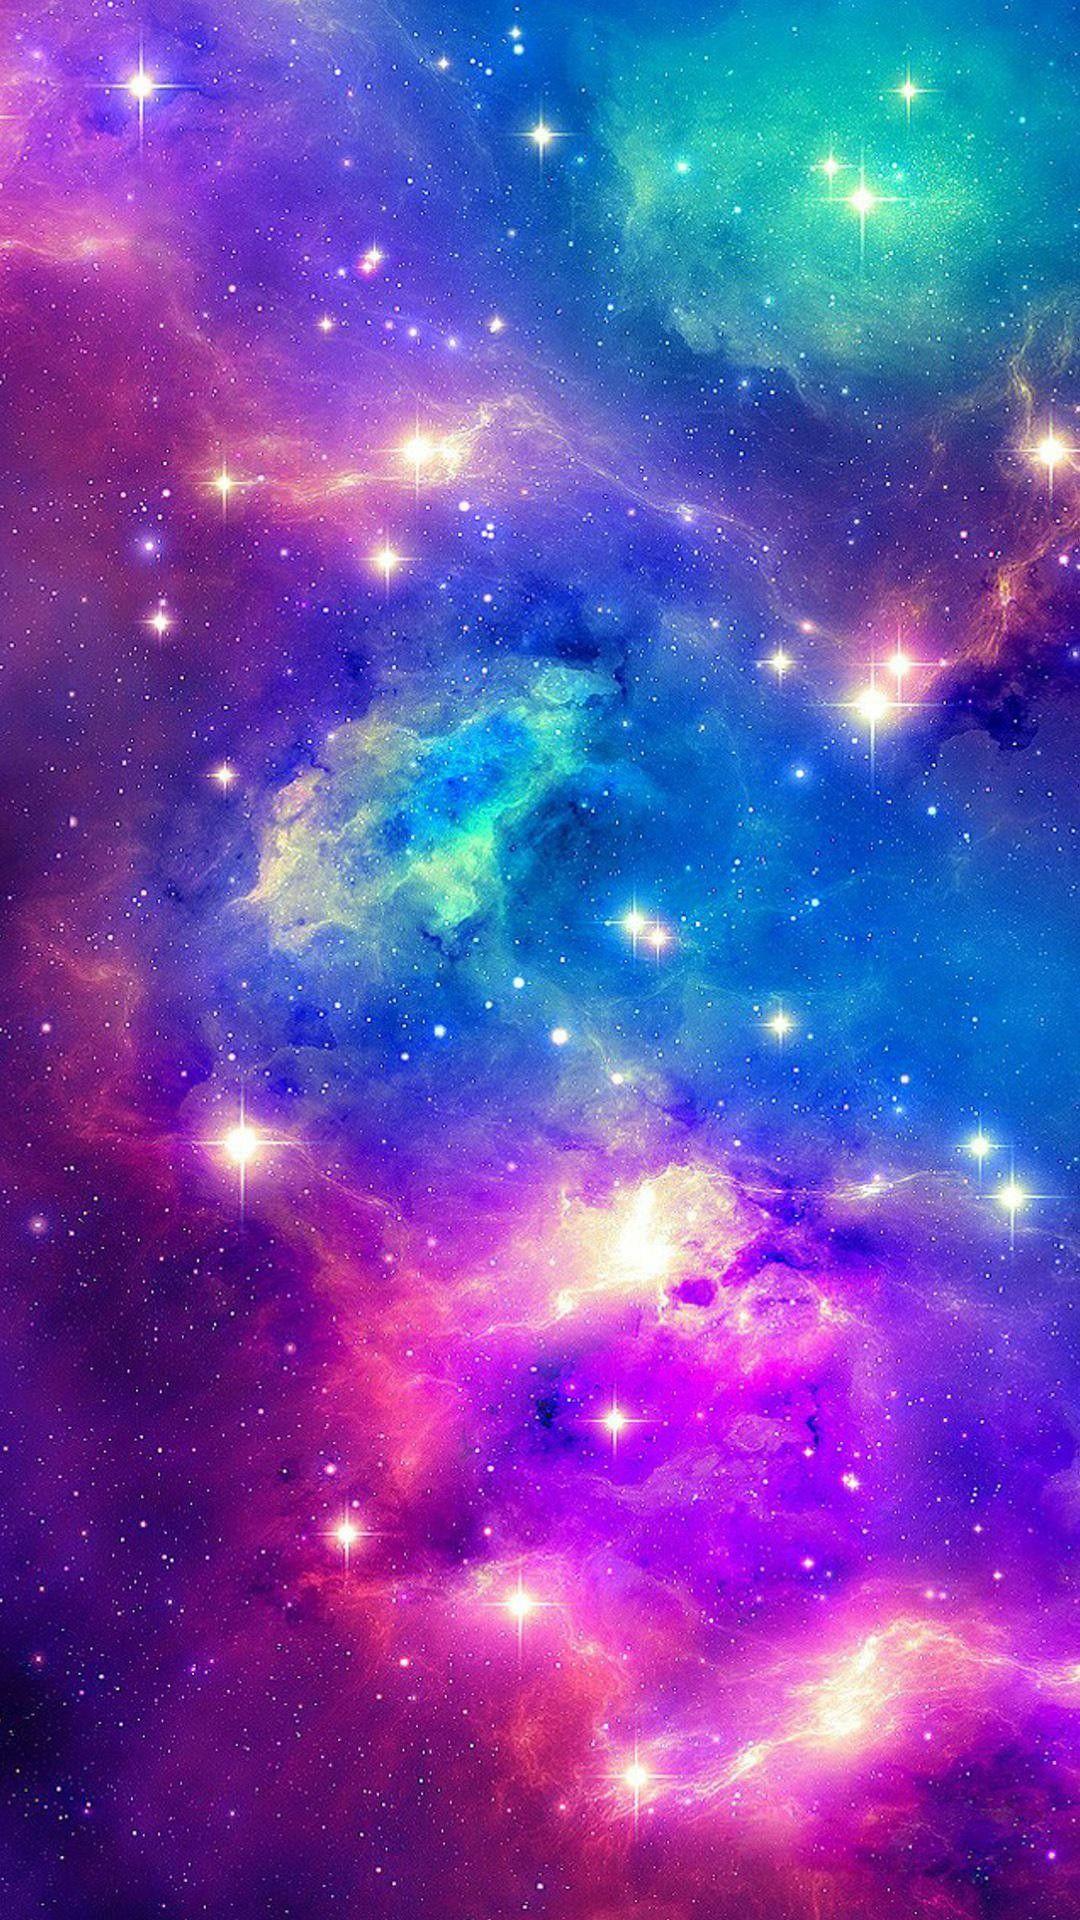 Aesthetic Wallpaper 24 Cute Galaxy Wallpaper Pastel Galaxy Galaxy Wallpaper